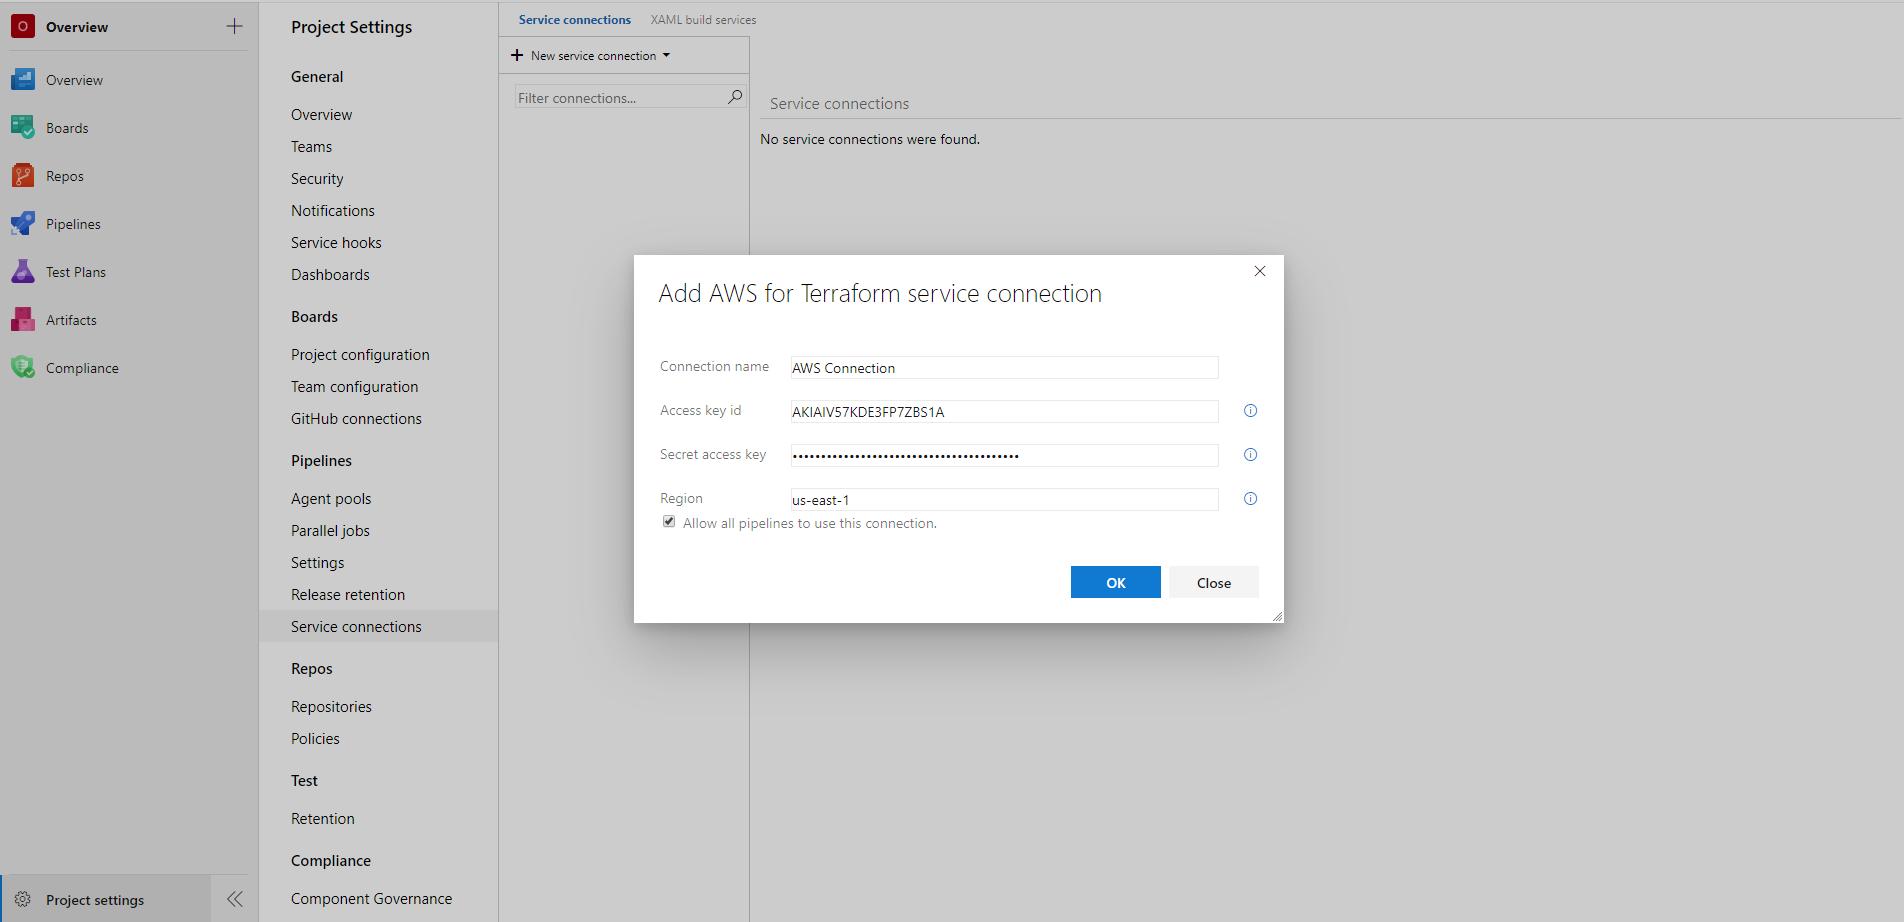 Creating an AWS service connection